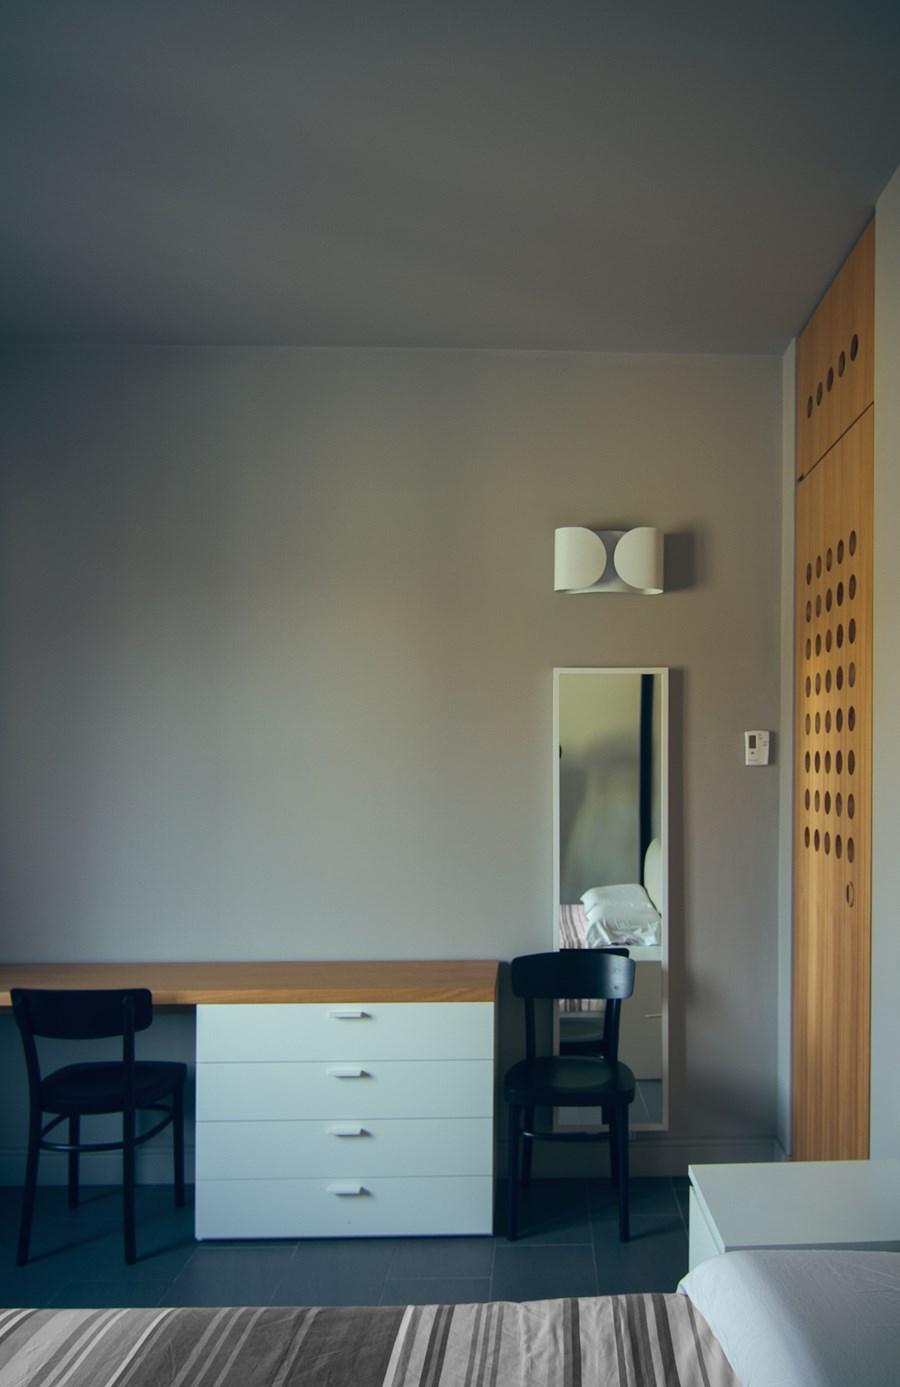 House#02 by Andrea Rubini architect 10